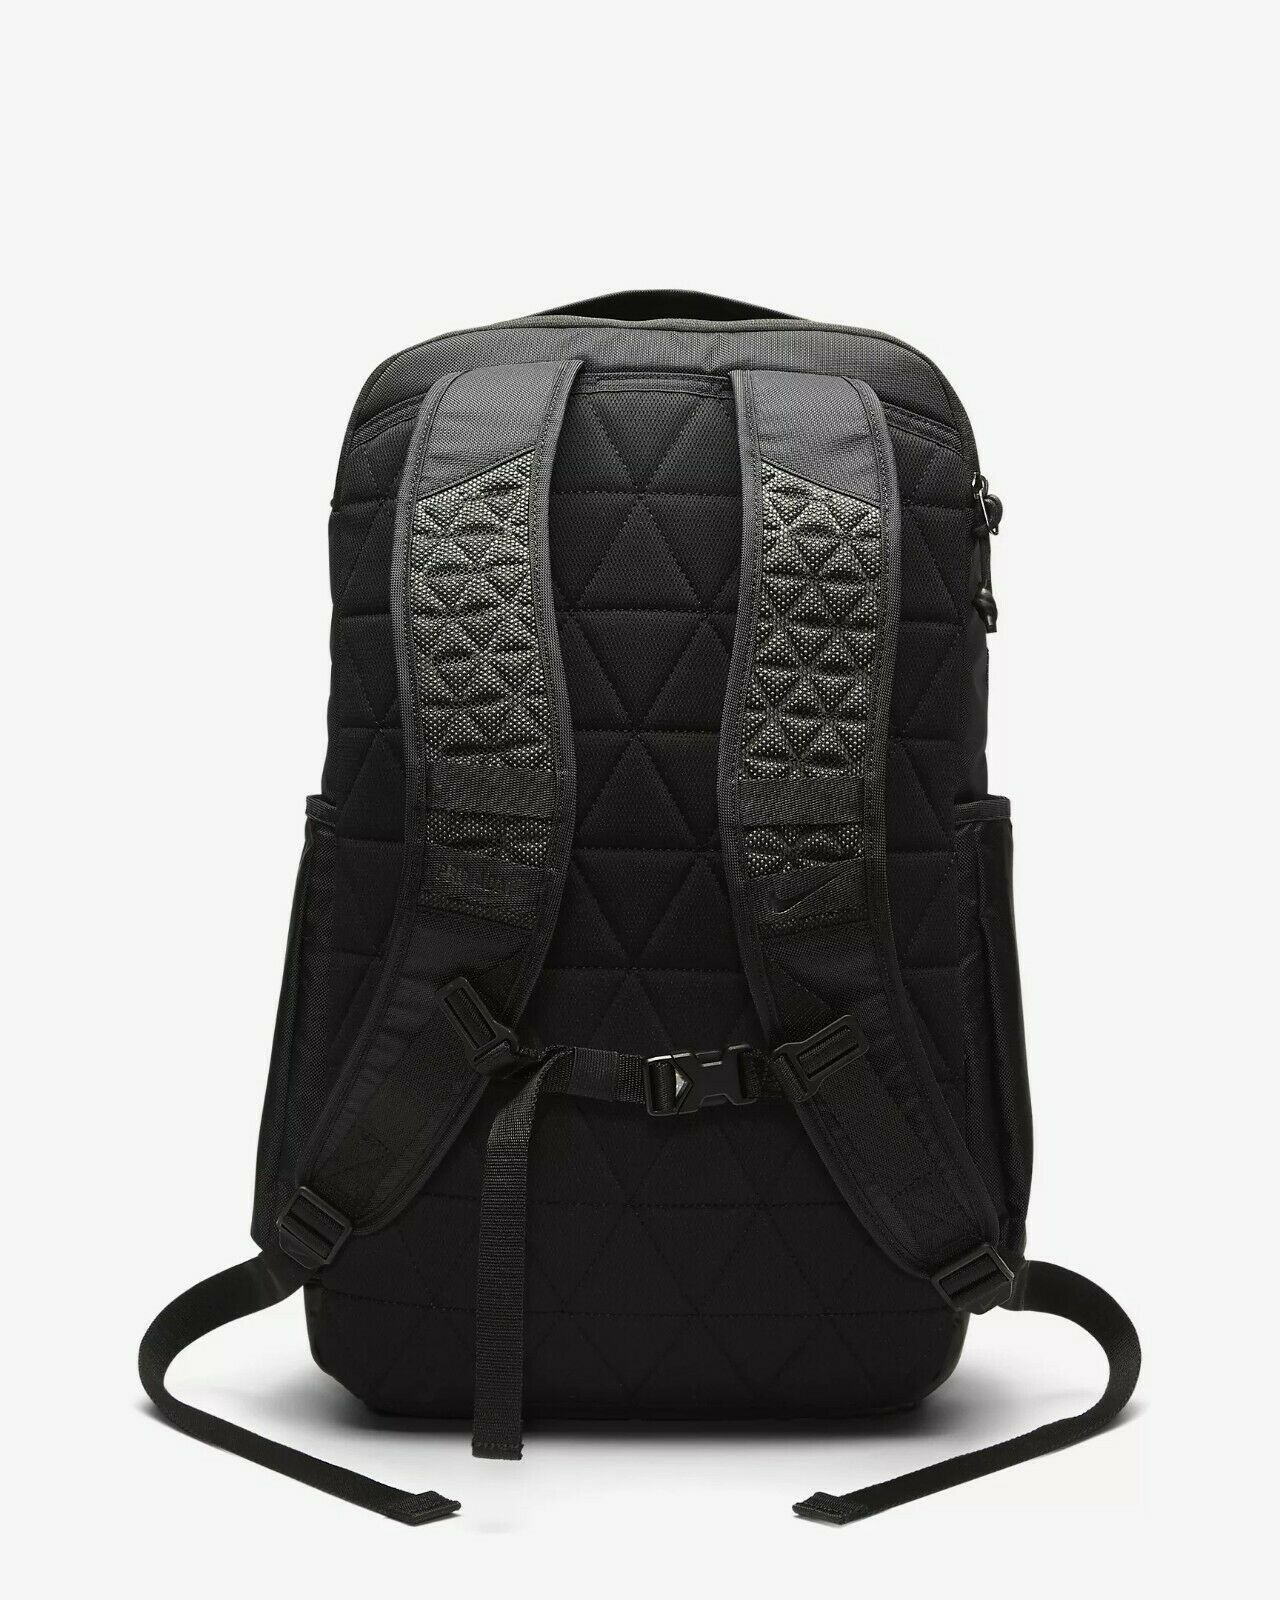 Nike Vapor Power 2.0 Training Backpack, BA5539 010 Black/Black/Black image 7